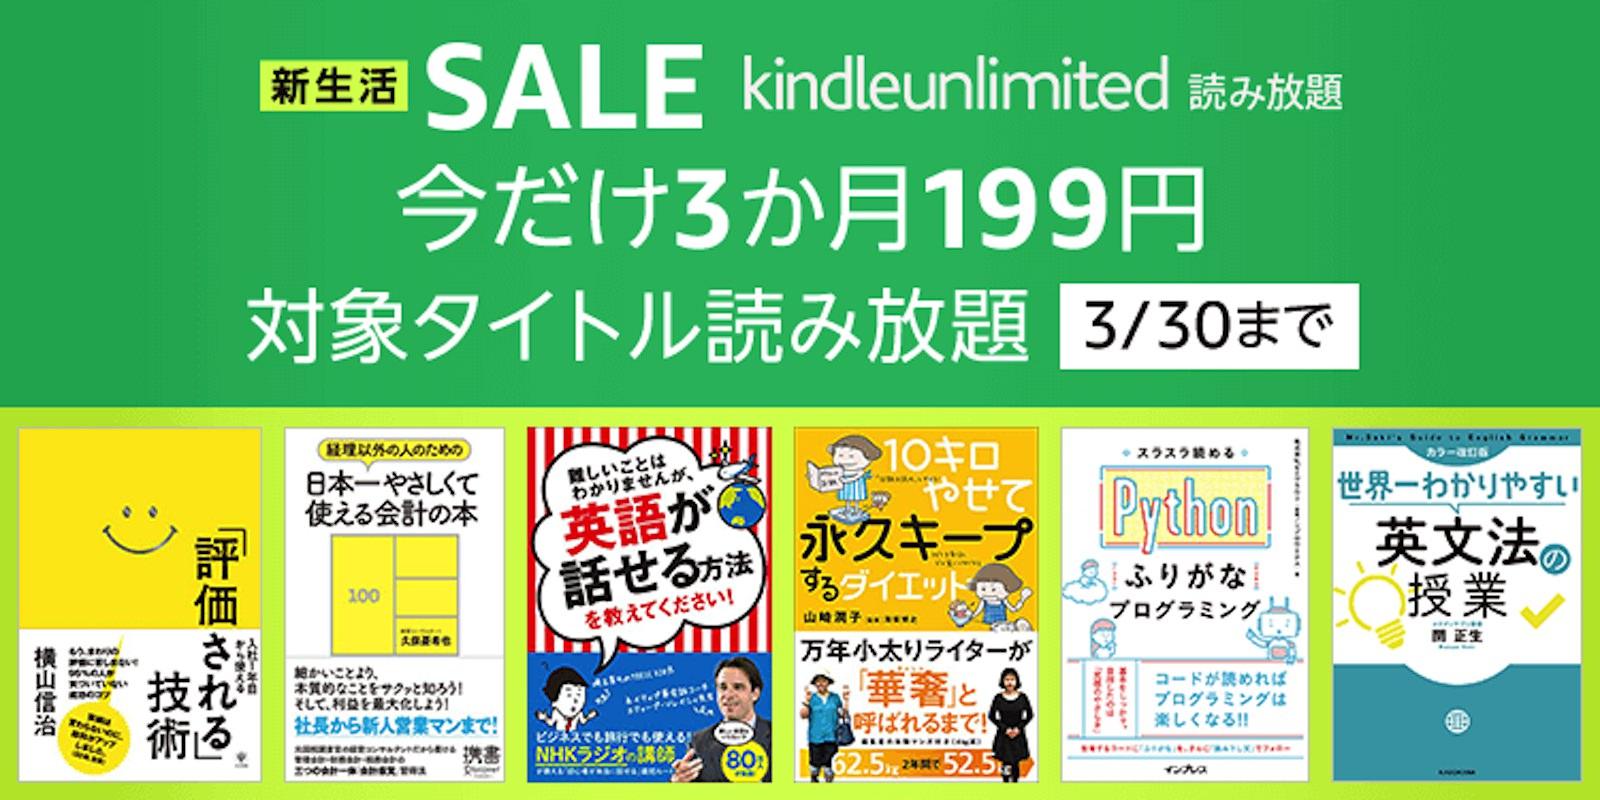 Kindle unlimited sale